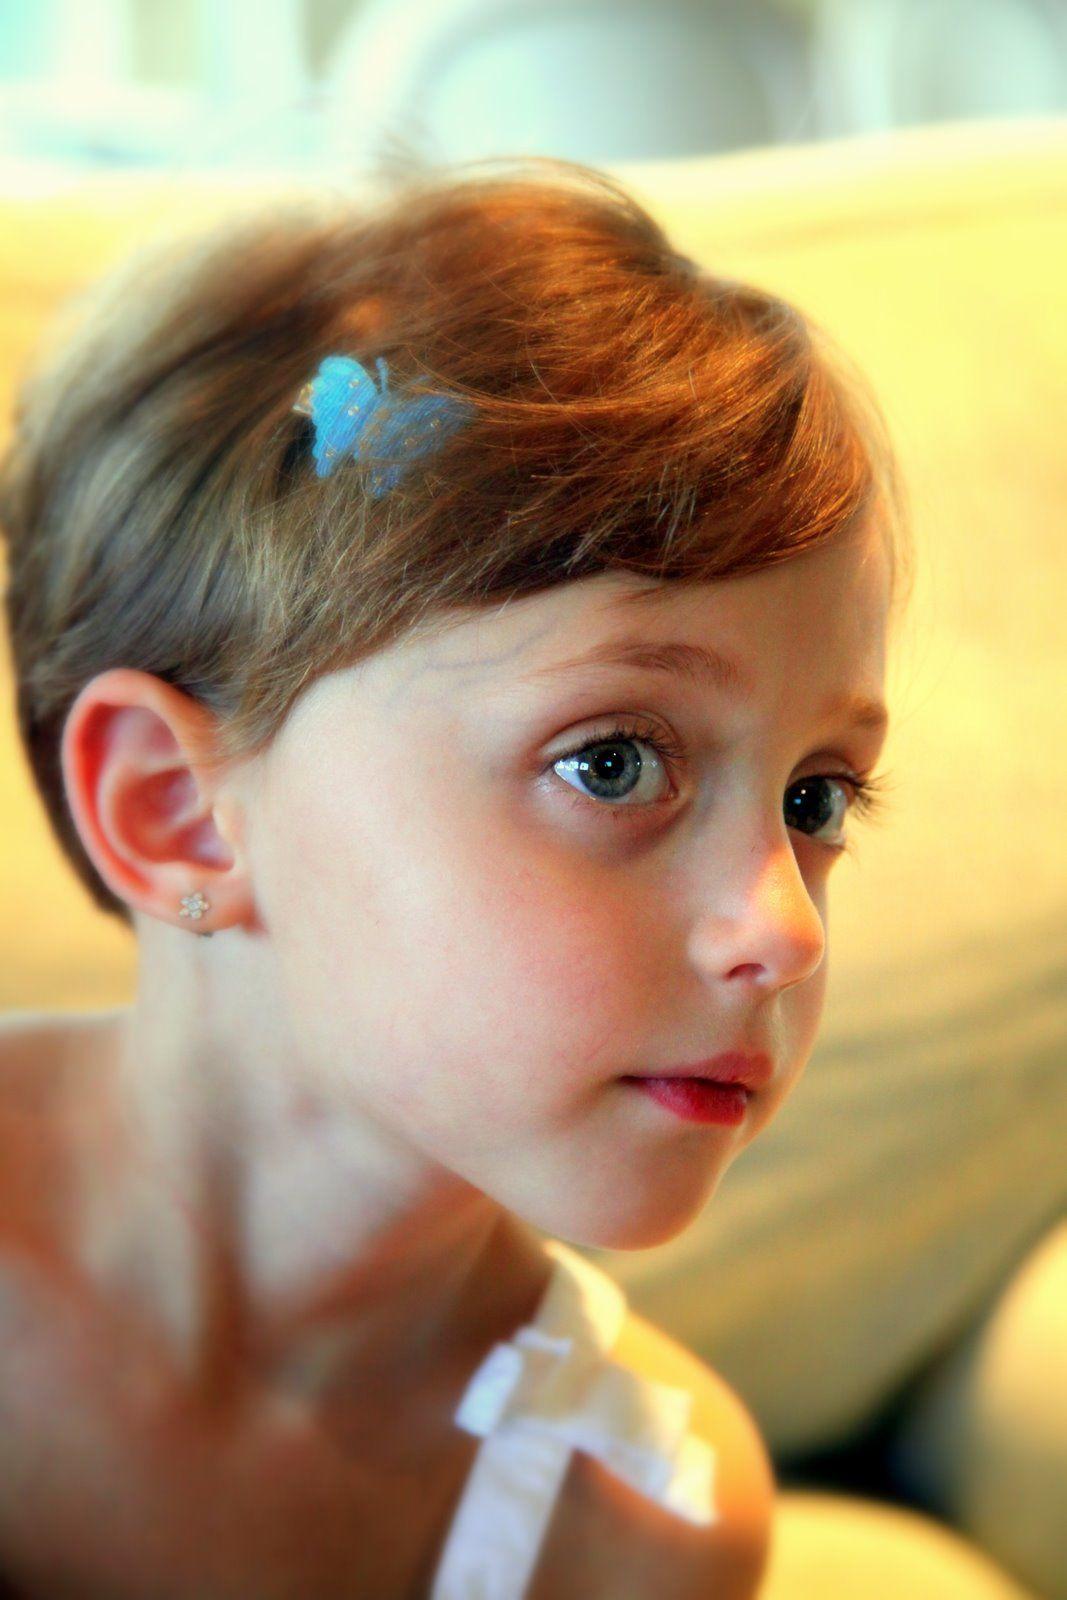 Little Girl Hairstyles For Short Hair Pinterest  Girls pixie short haircut hairstyle